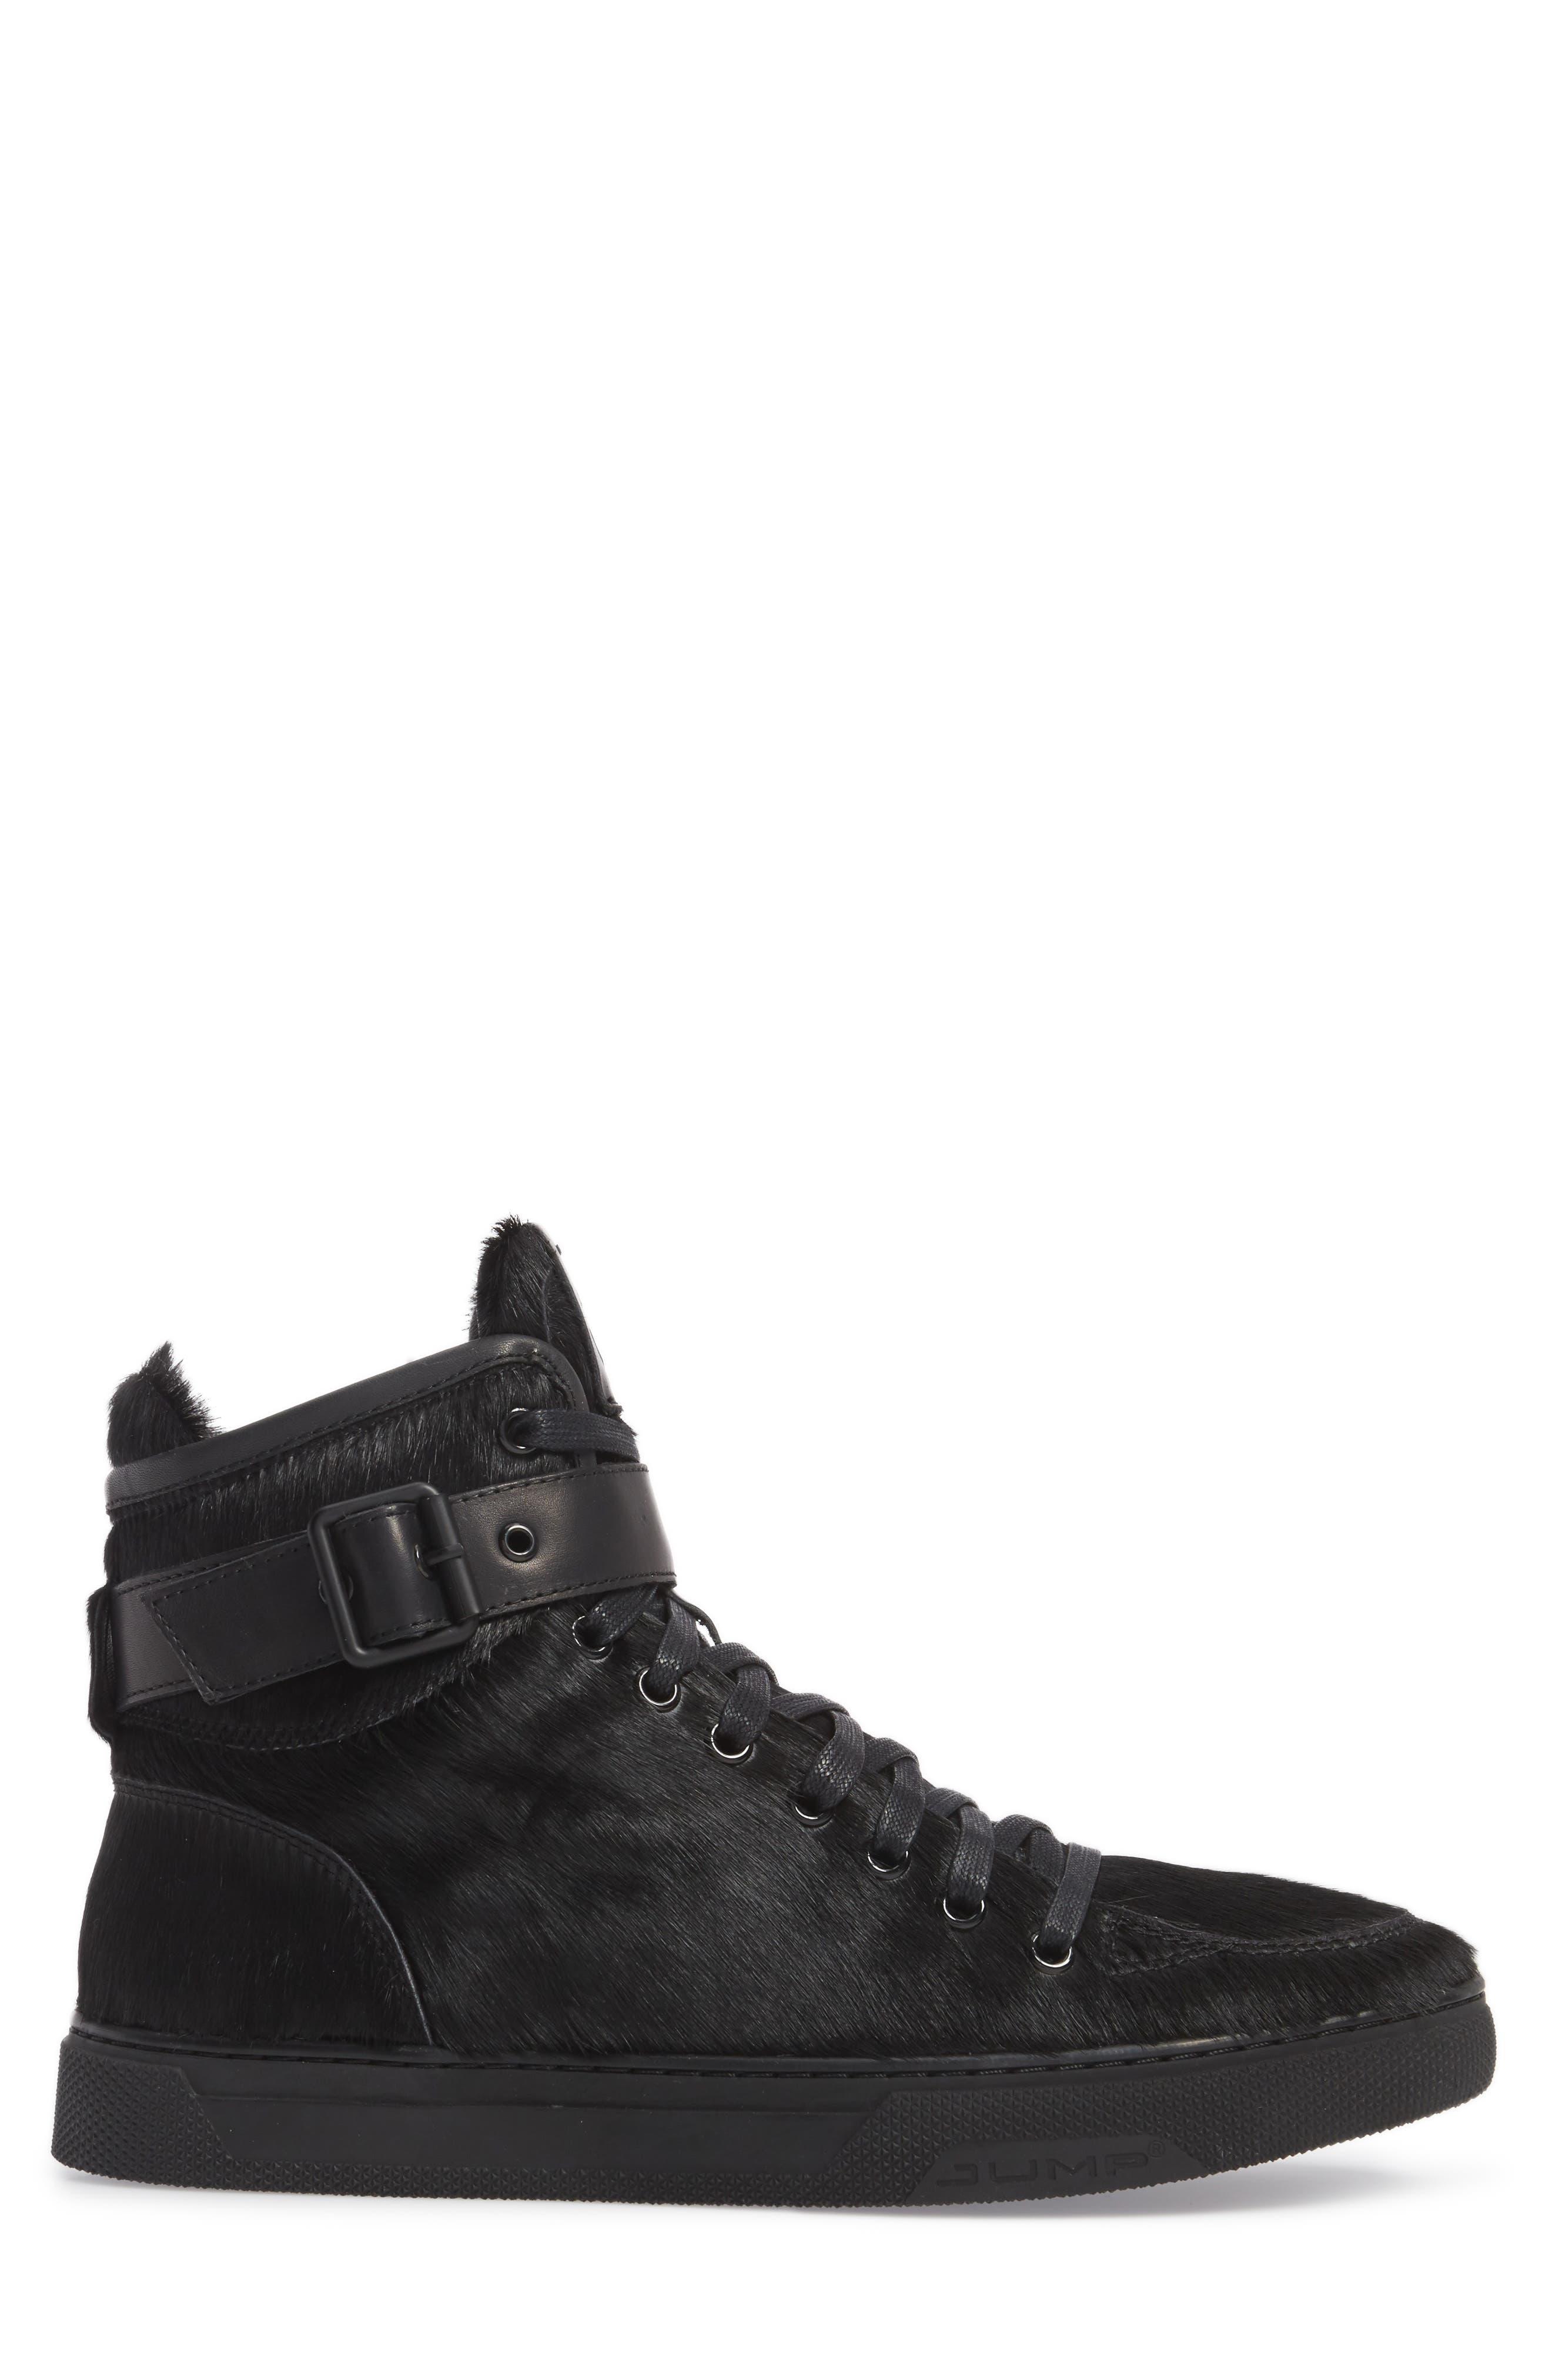 Sullivan Genuine Calf Hair High Top Sneaker,                             Alternate thumbnail 3, color,                             Black Fur Leather